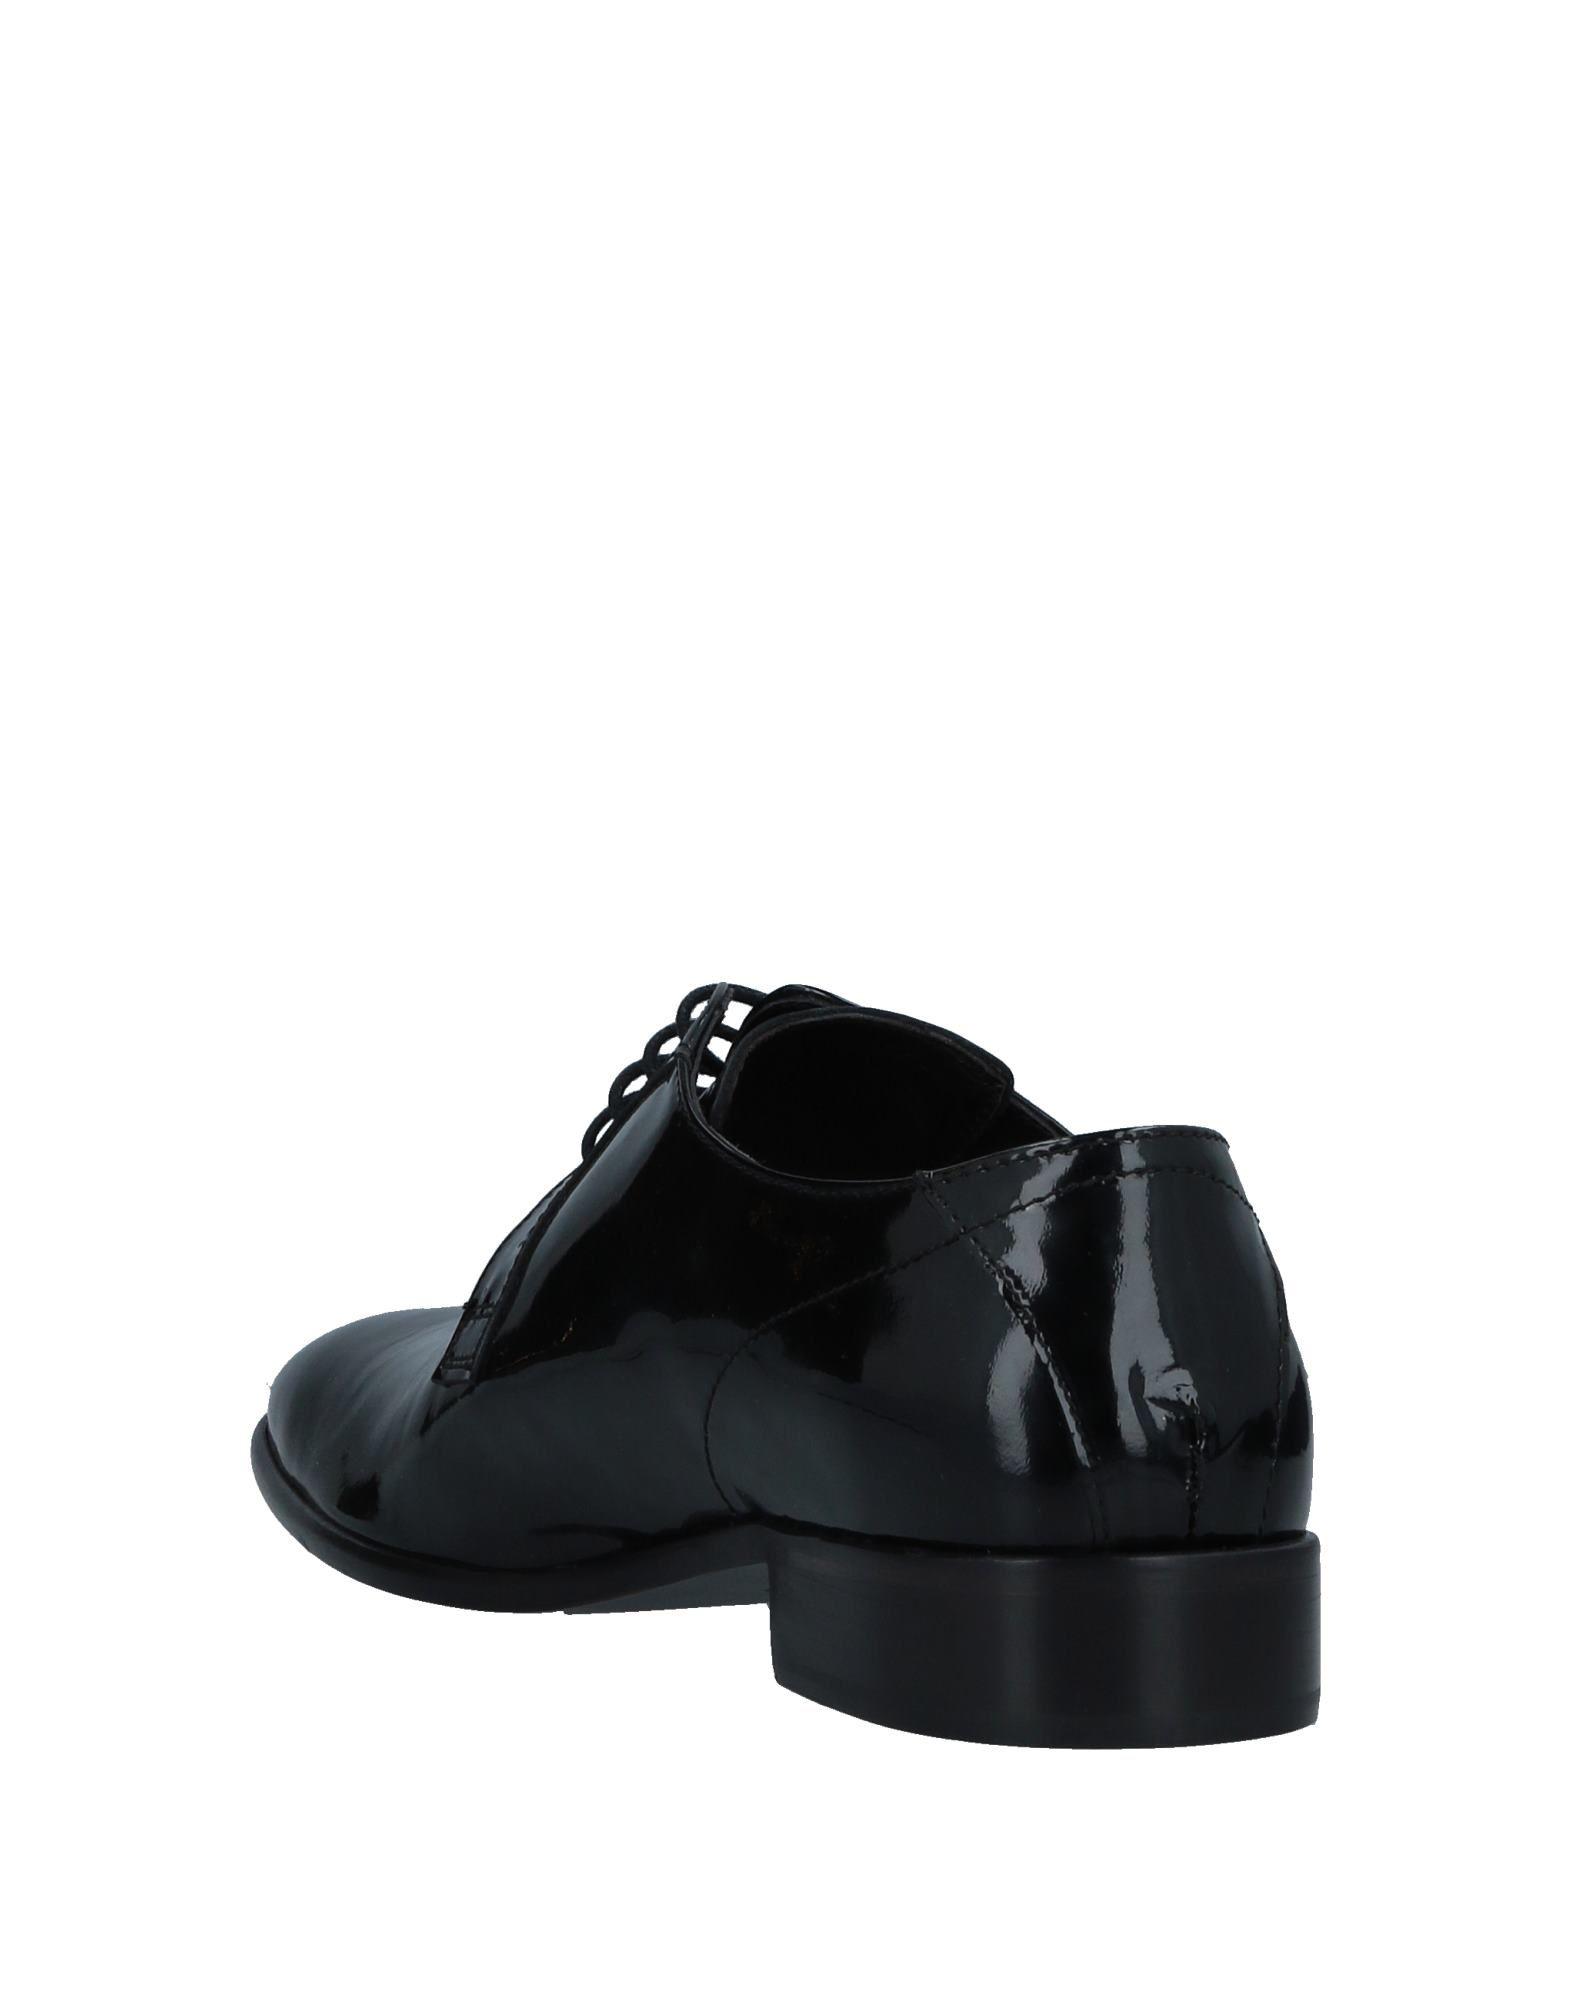 Rabatt echte Schuhe Giulio 11520828WB Montano Schnürschuhe Herren  11520828WB Giulio 8db143